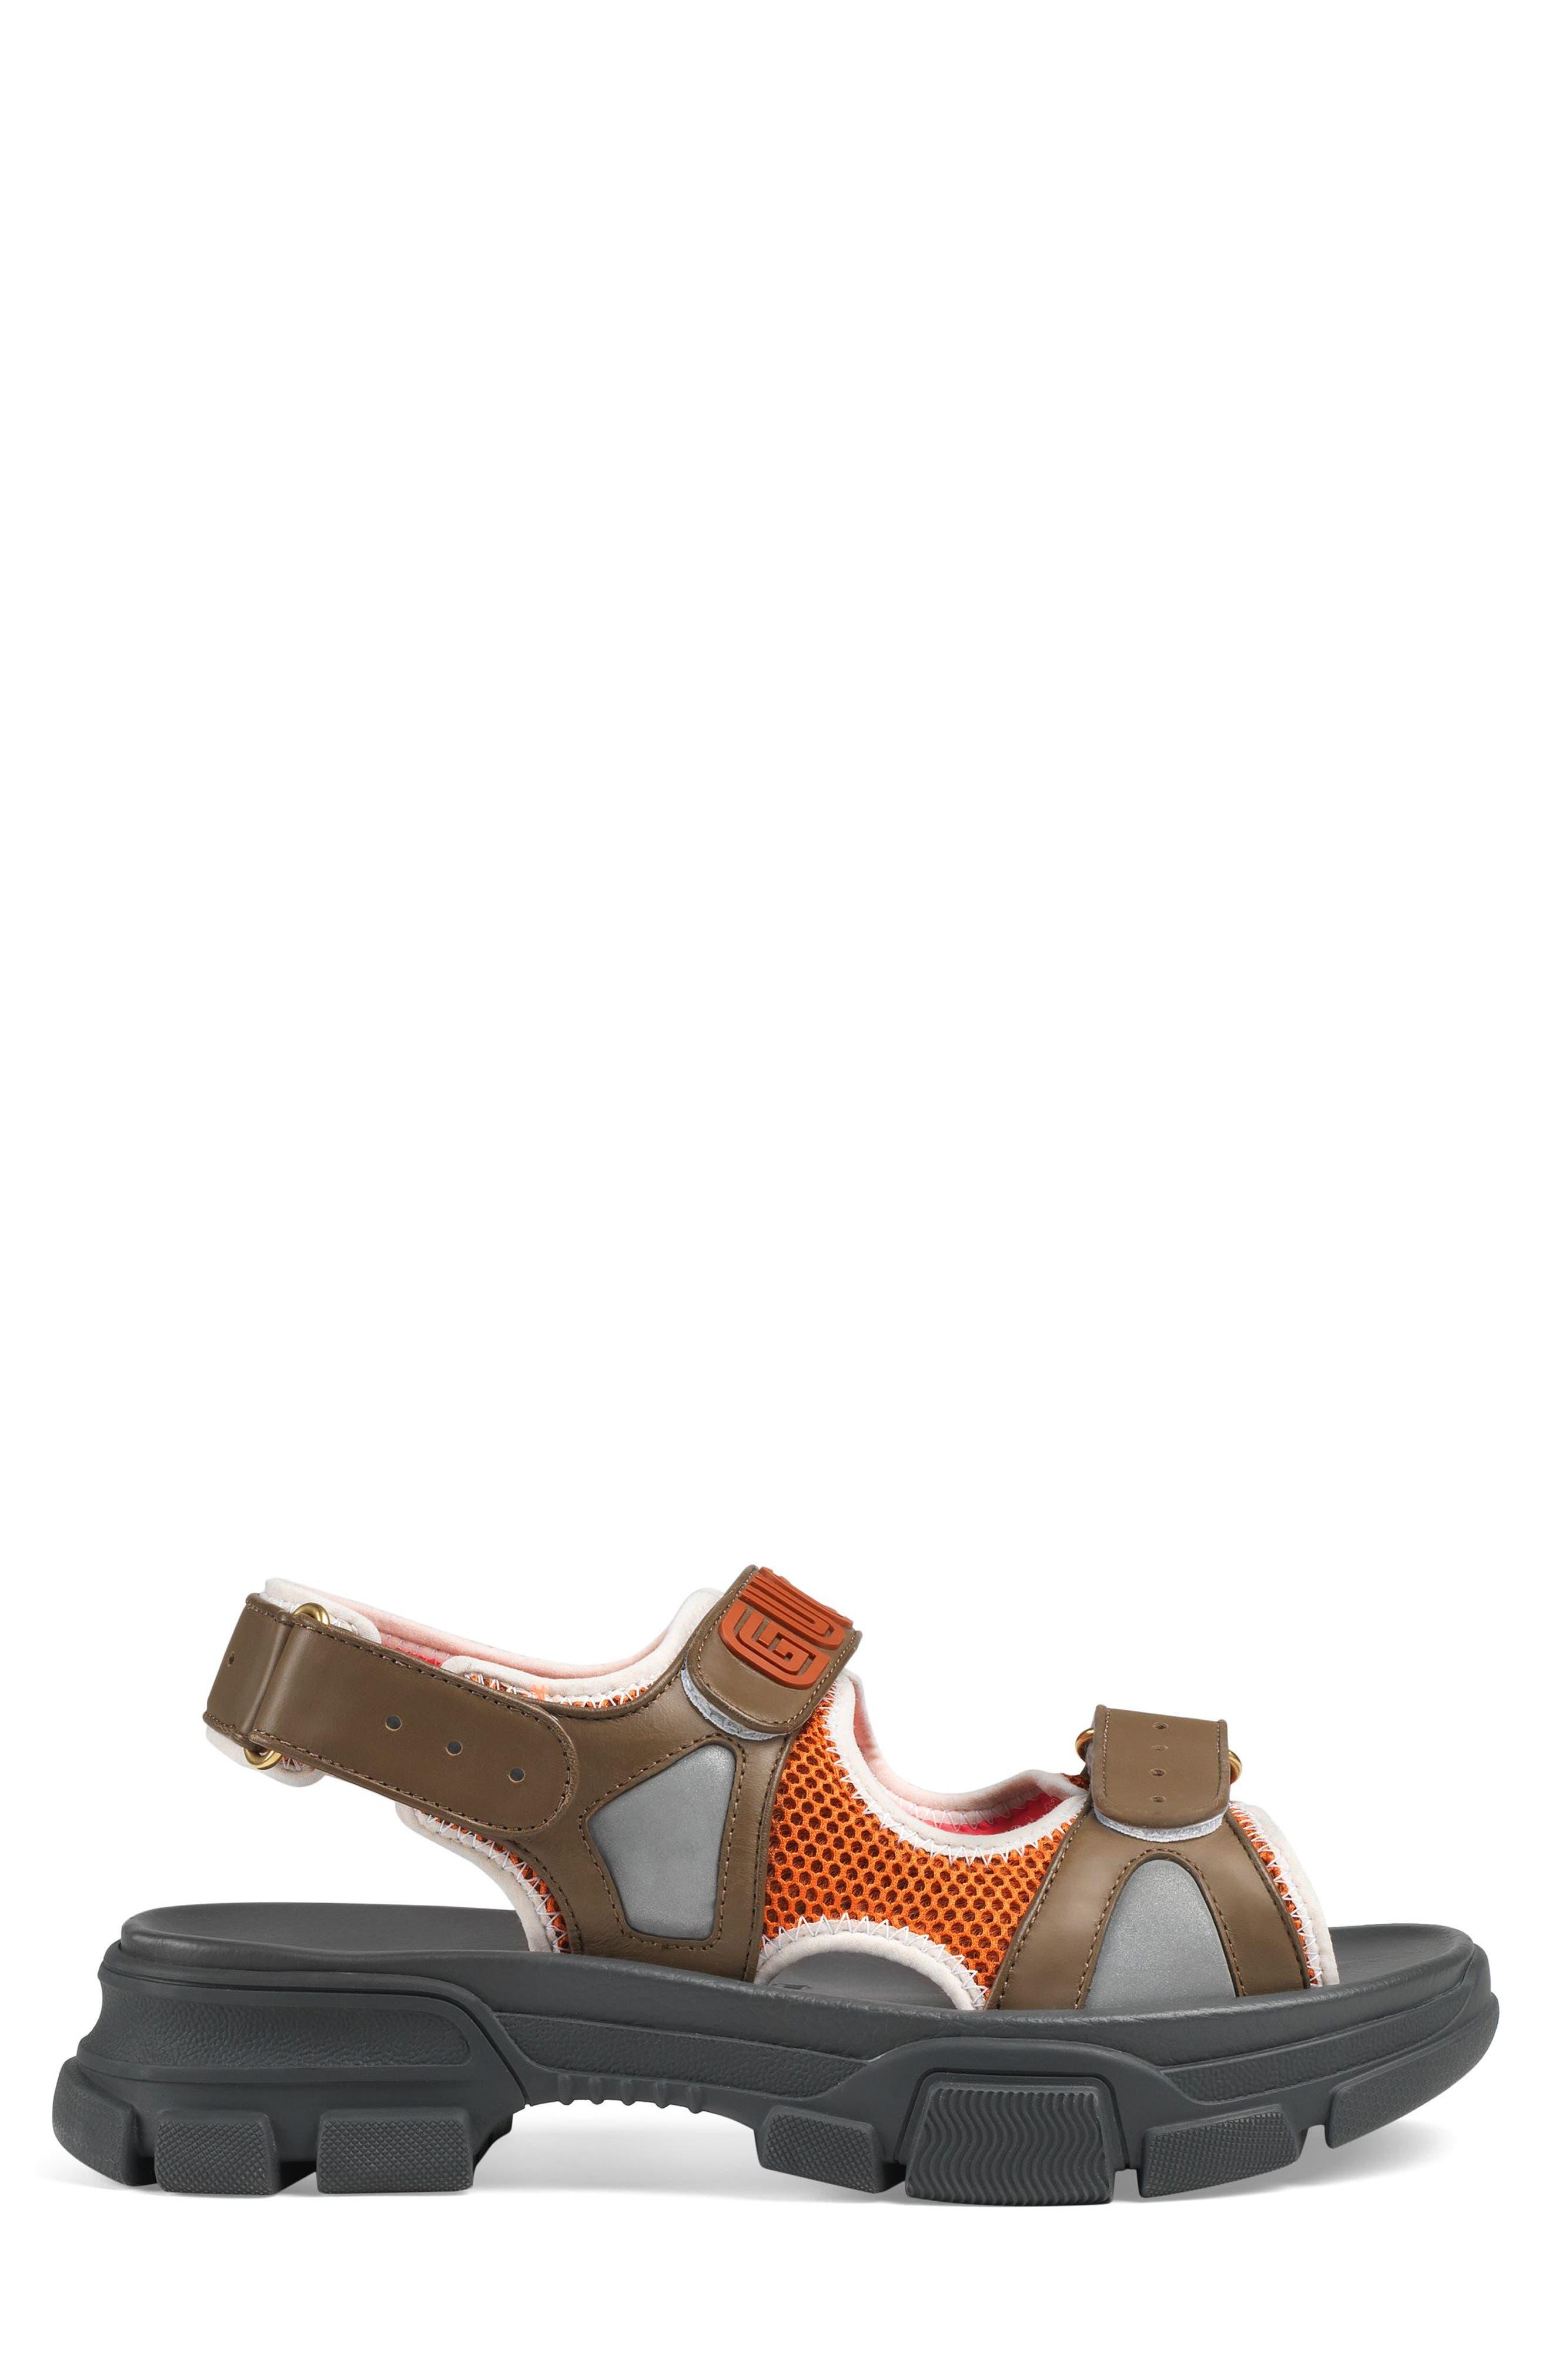 Agru Sport Sandal,                             Alternate thumbnail 2, color,                             BROWN